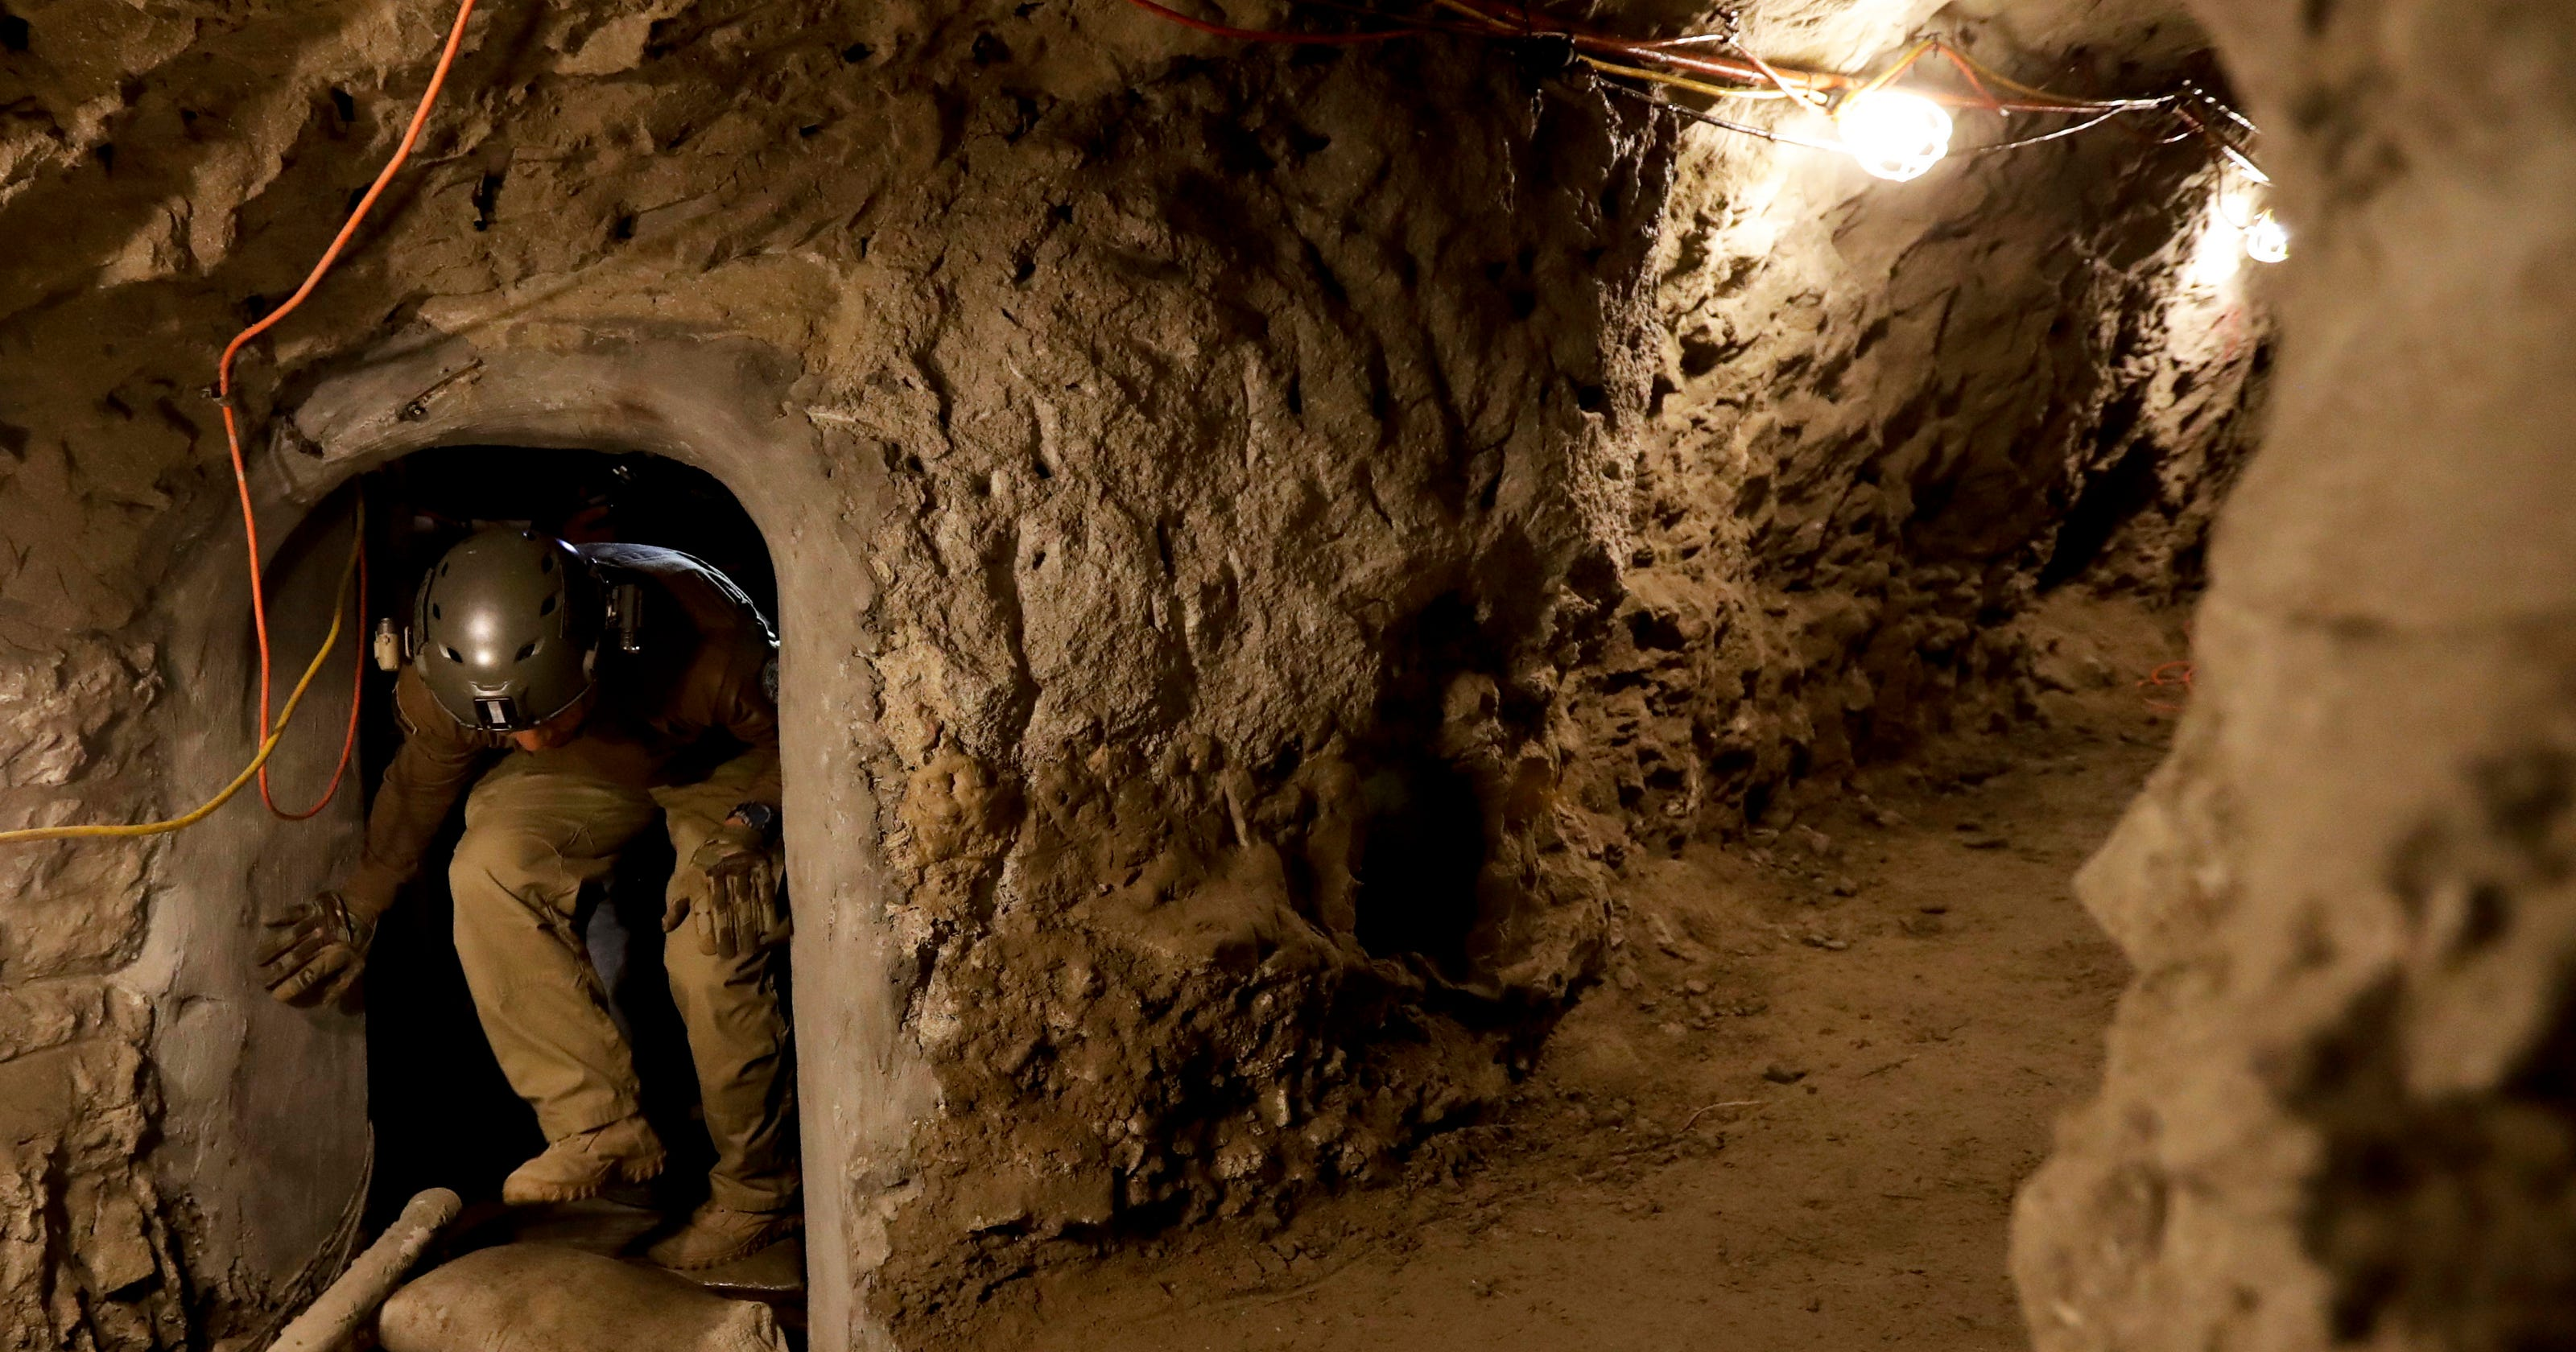 Amid border wall debate, third drug tunnel found in less than a month along Arizona border